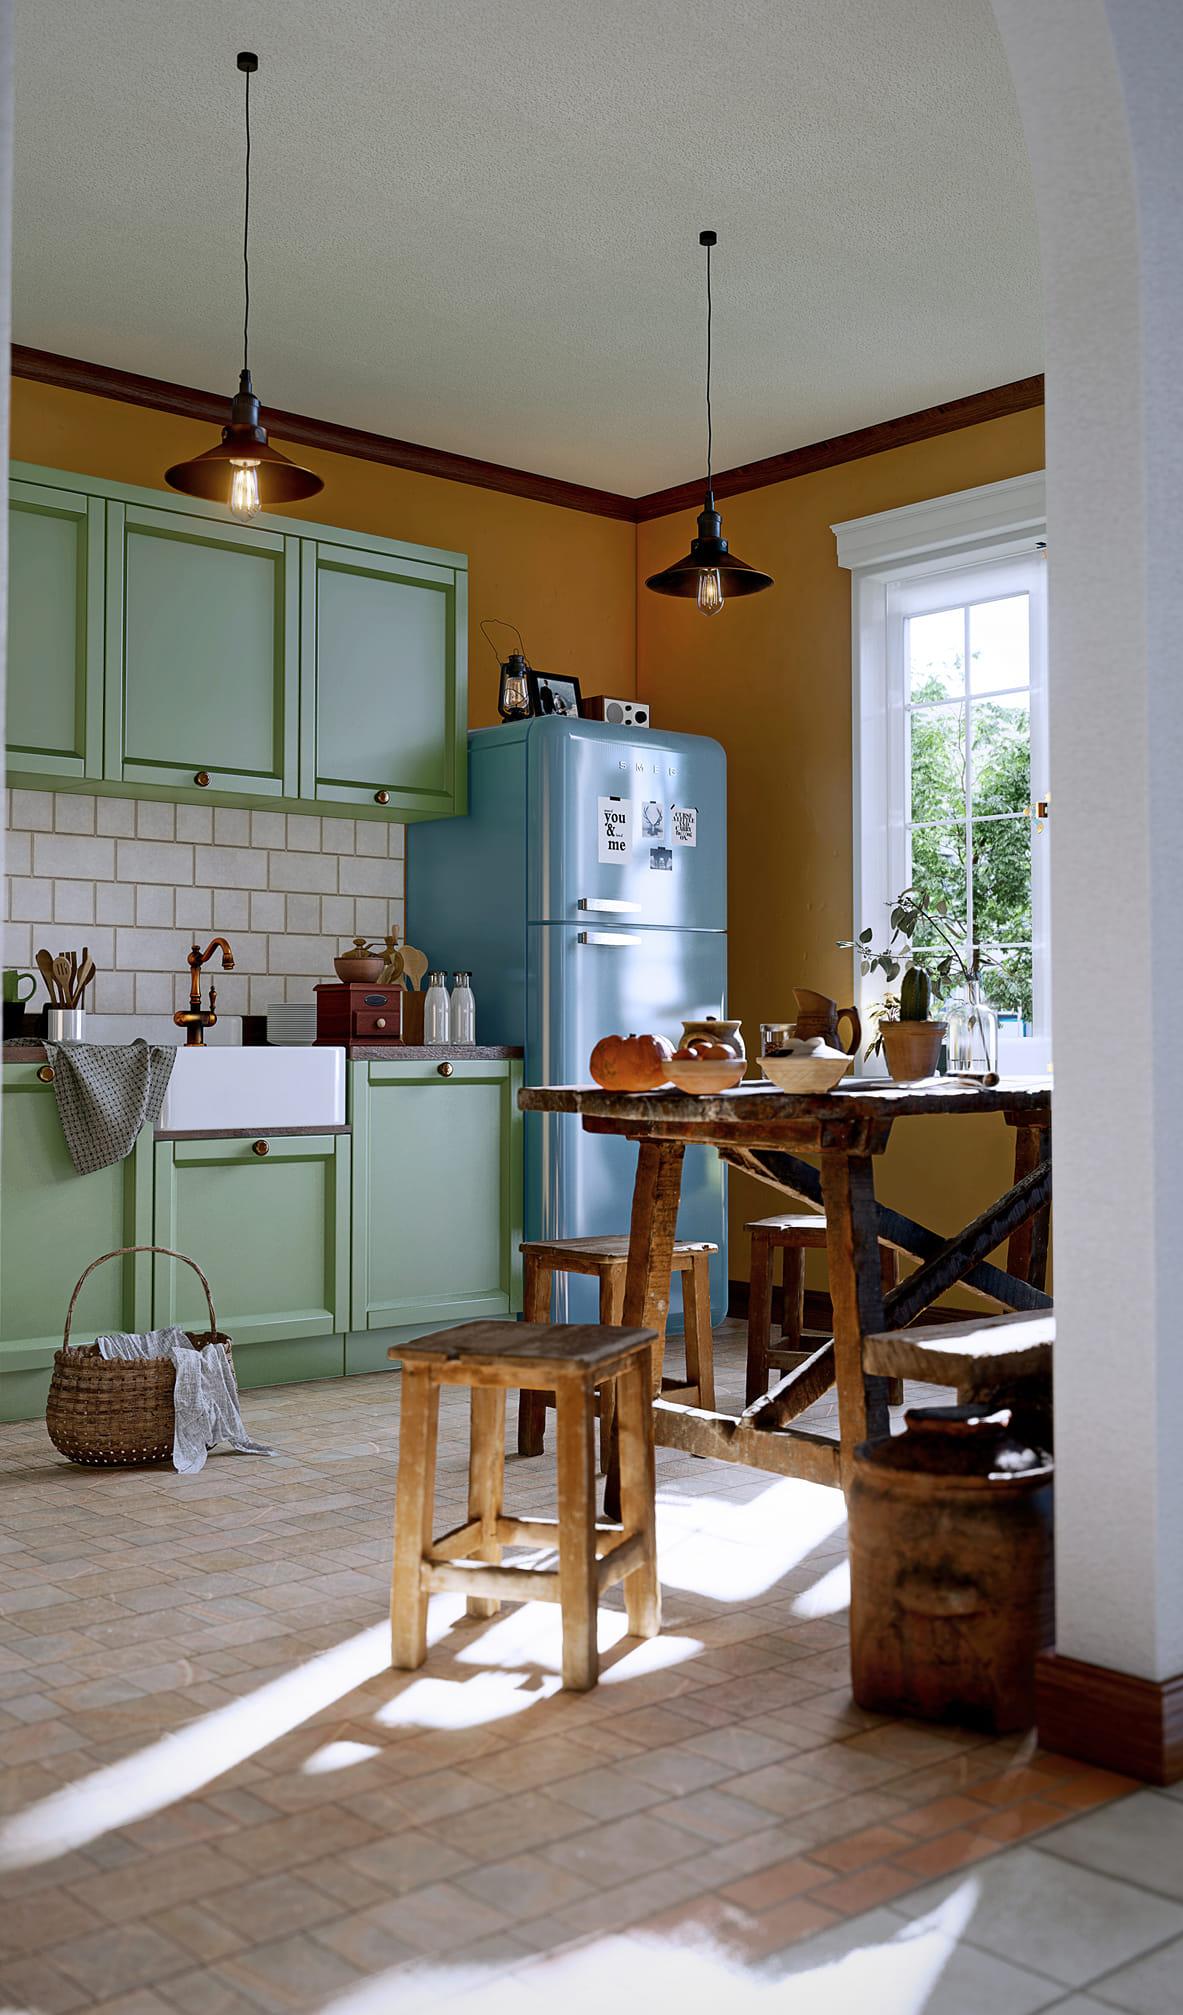 Cucina vintage, resa in Lumion da Aditya Pradana.